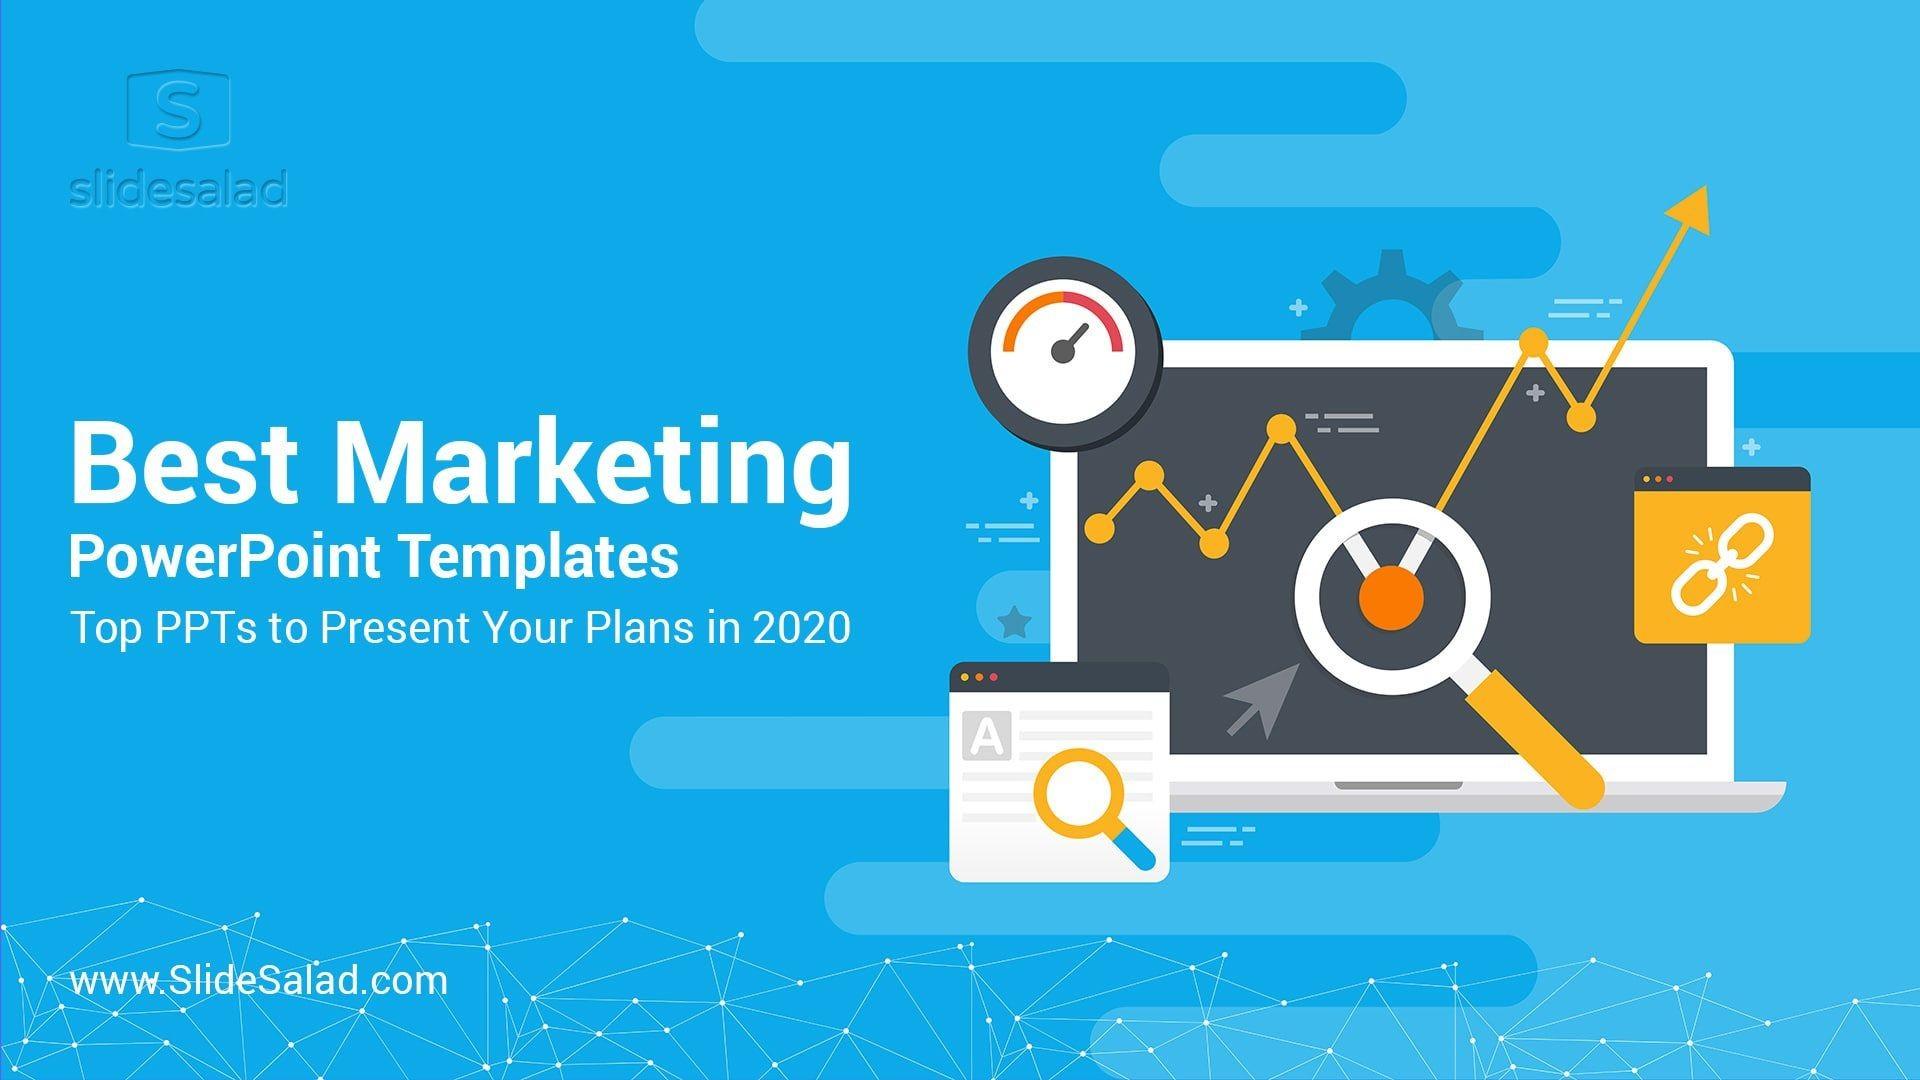 003 Impressive Free Digital Marketing Plan Template Ppt Photo 1920